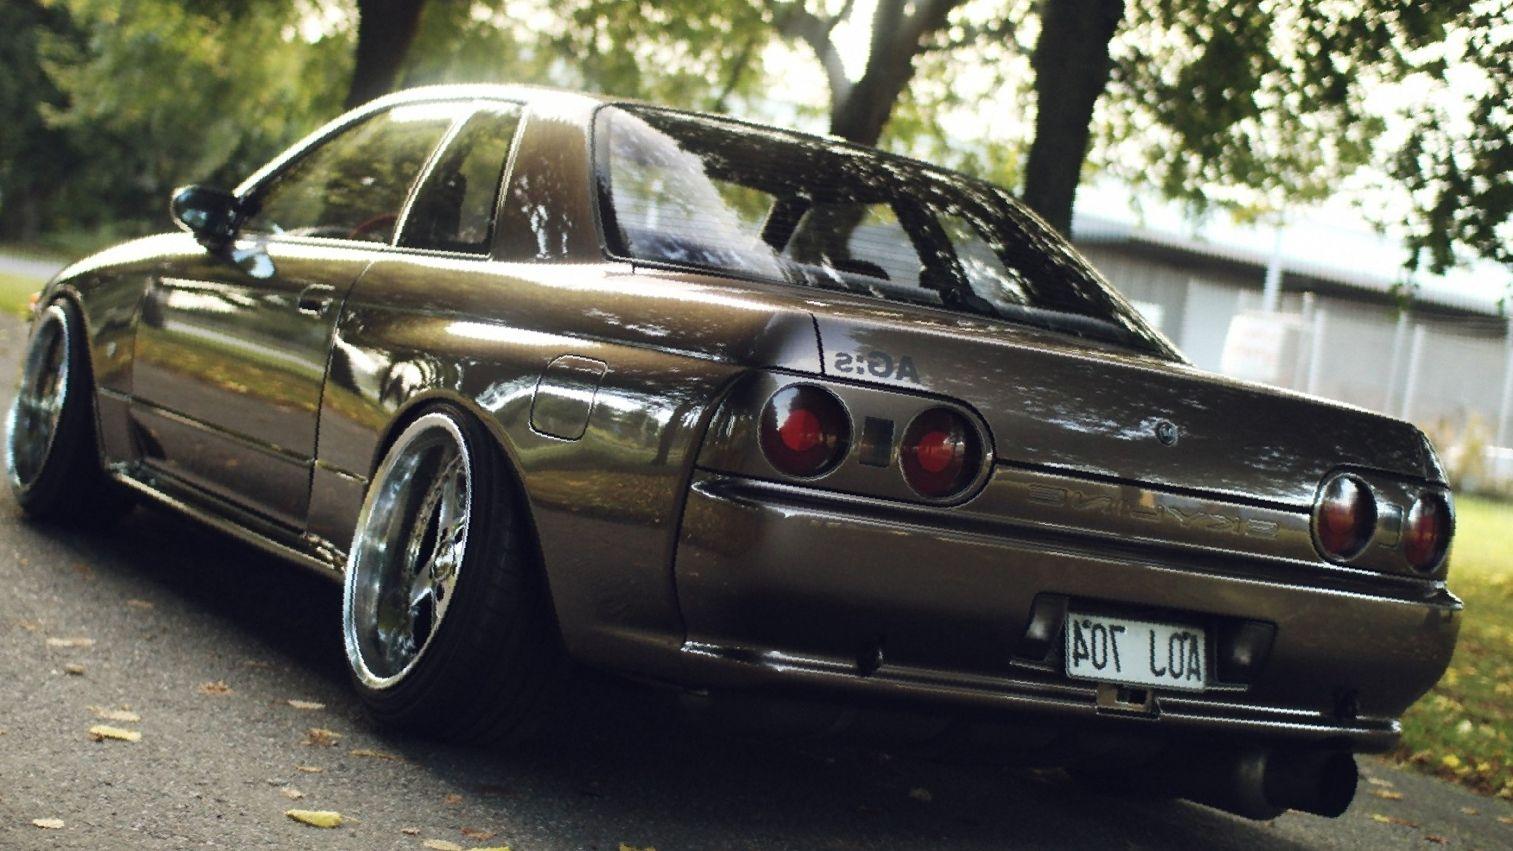 Nissan Skyline R32 Wallpapers 11 1513x851 Download Hd Wallpaper Wallpapertip